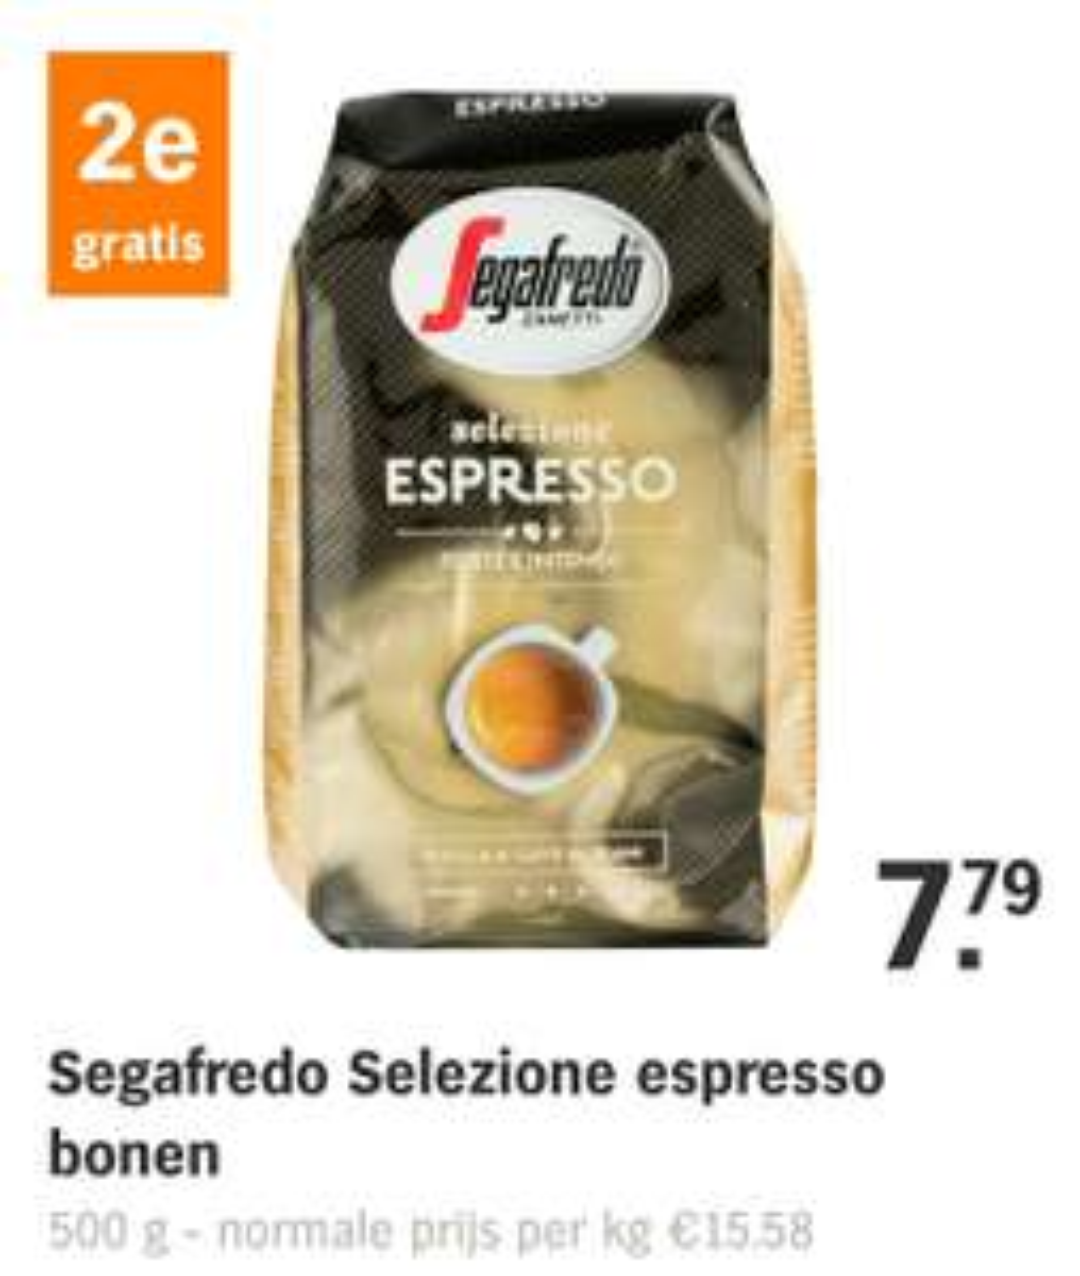 Alle Segafredo koffie 2e gratis bij AH